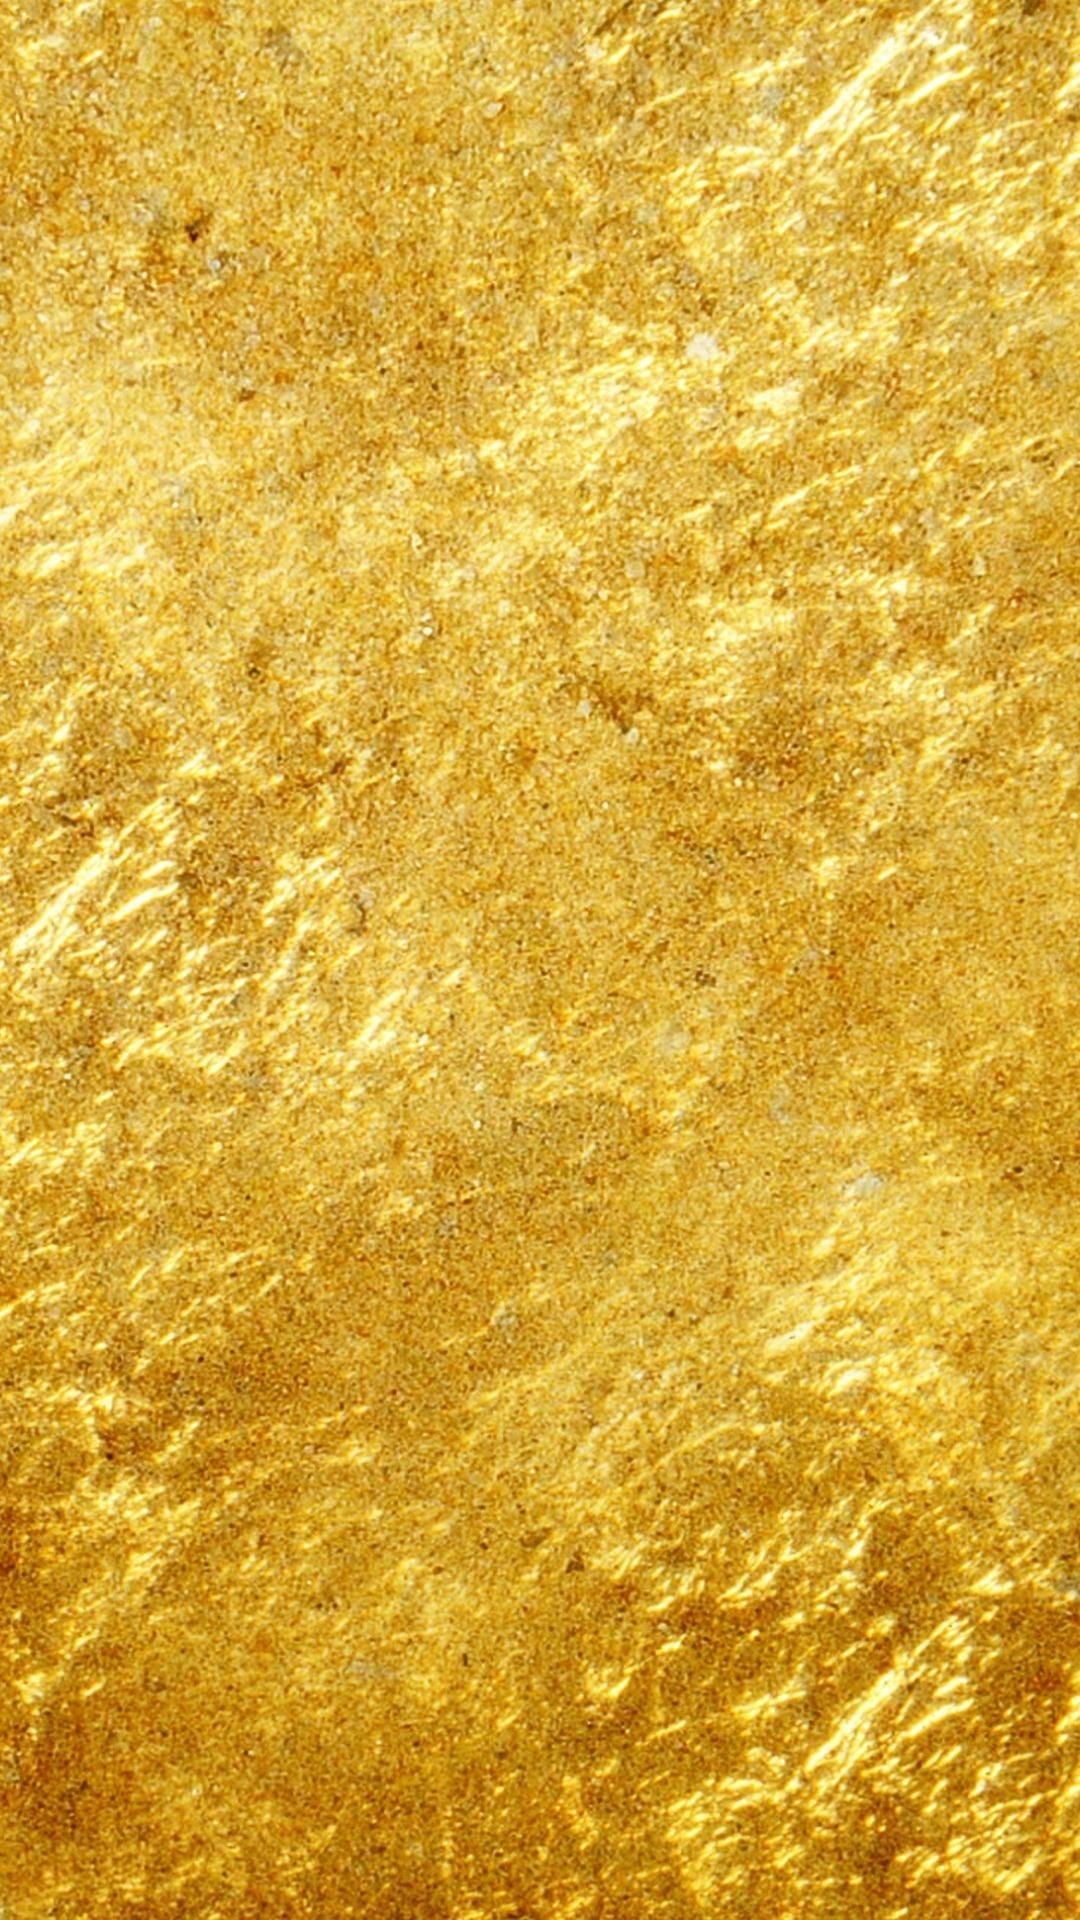 Gold iPhone 7 wallpaper